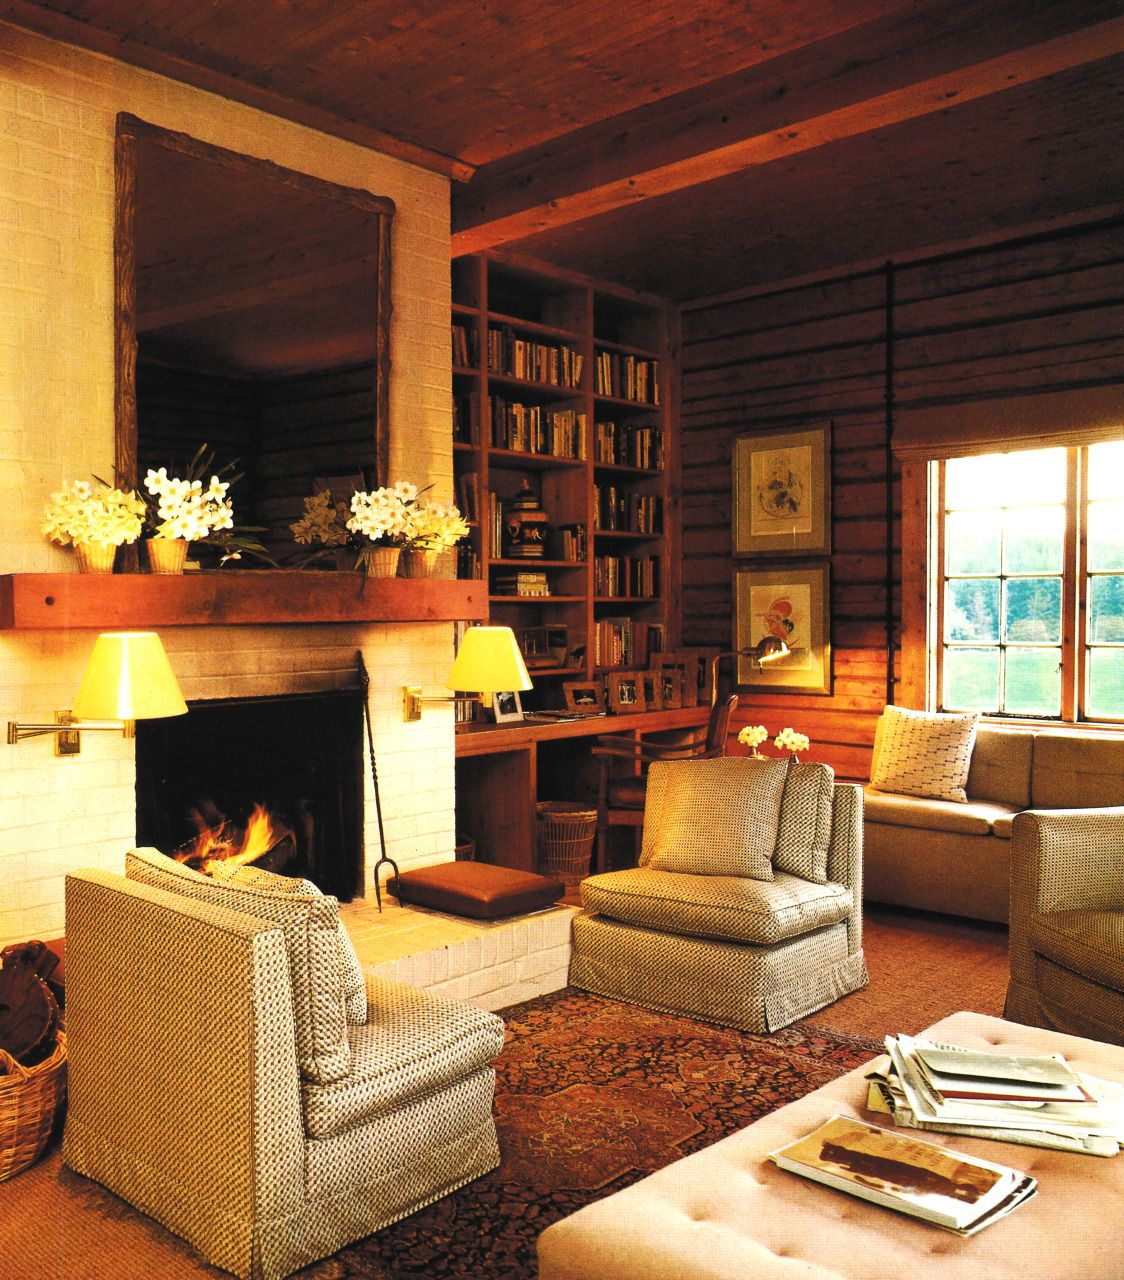 thegikitiki | 1980s living room, Home decor, 1980s decor